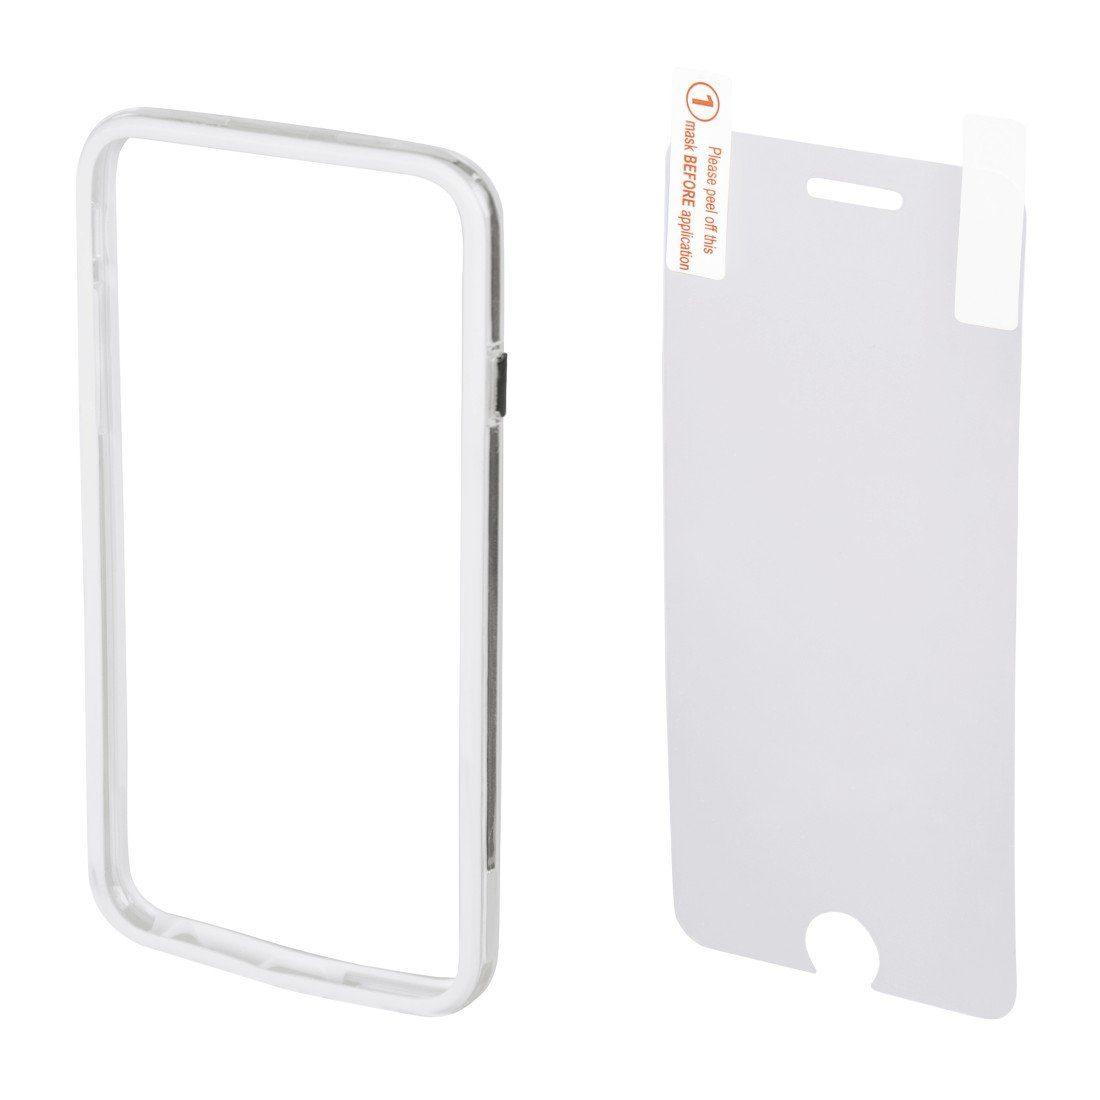 Hama Cover Edge Protector für Apple iPhone 6/6s + Displayfolie, Weiß